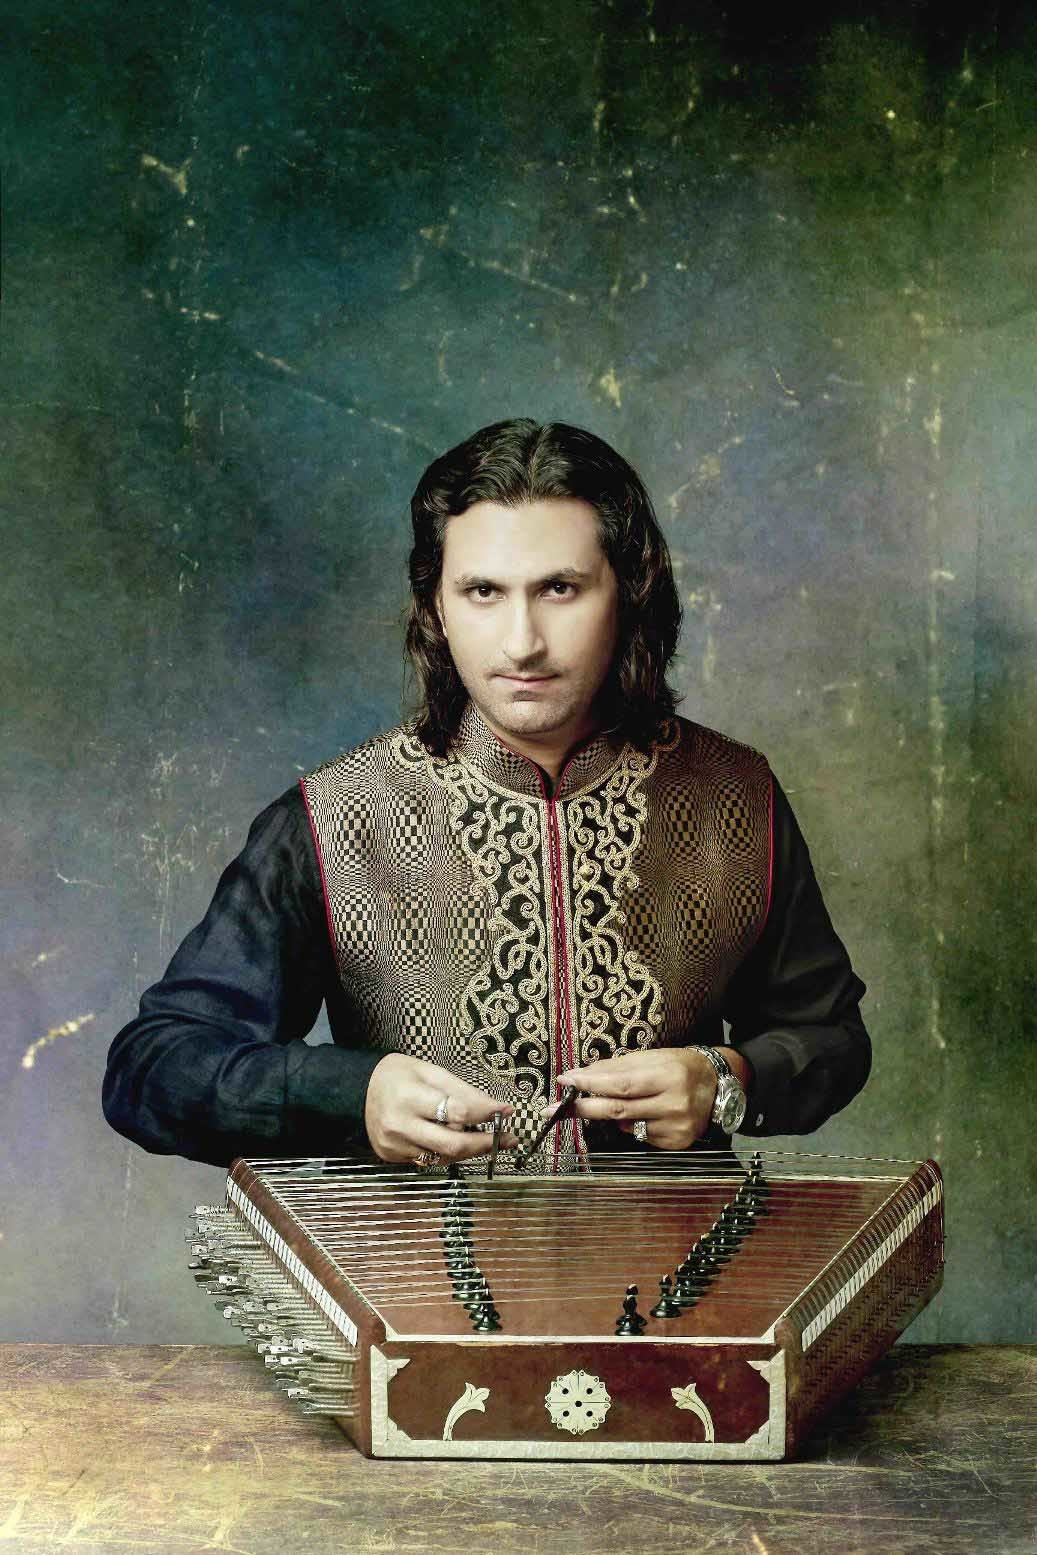 BWW Interview: Music Luminaries Rahul Sharma, Madhup Mudgal And Pandit Jasraj To Perform At Shriram Shankarlal Music Festival